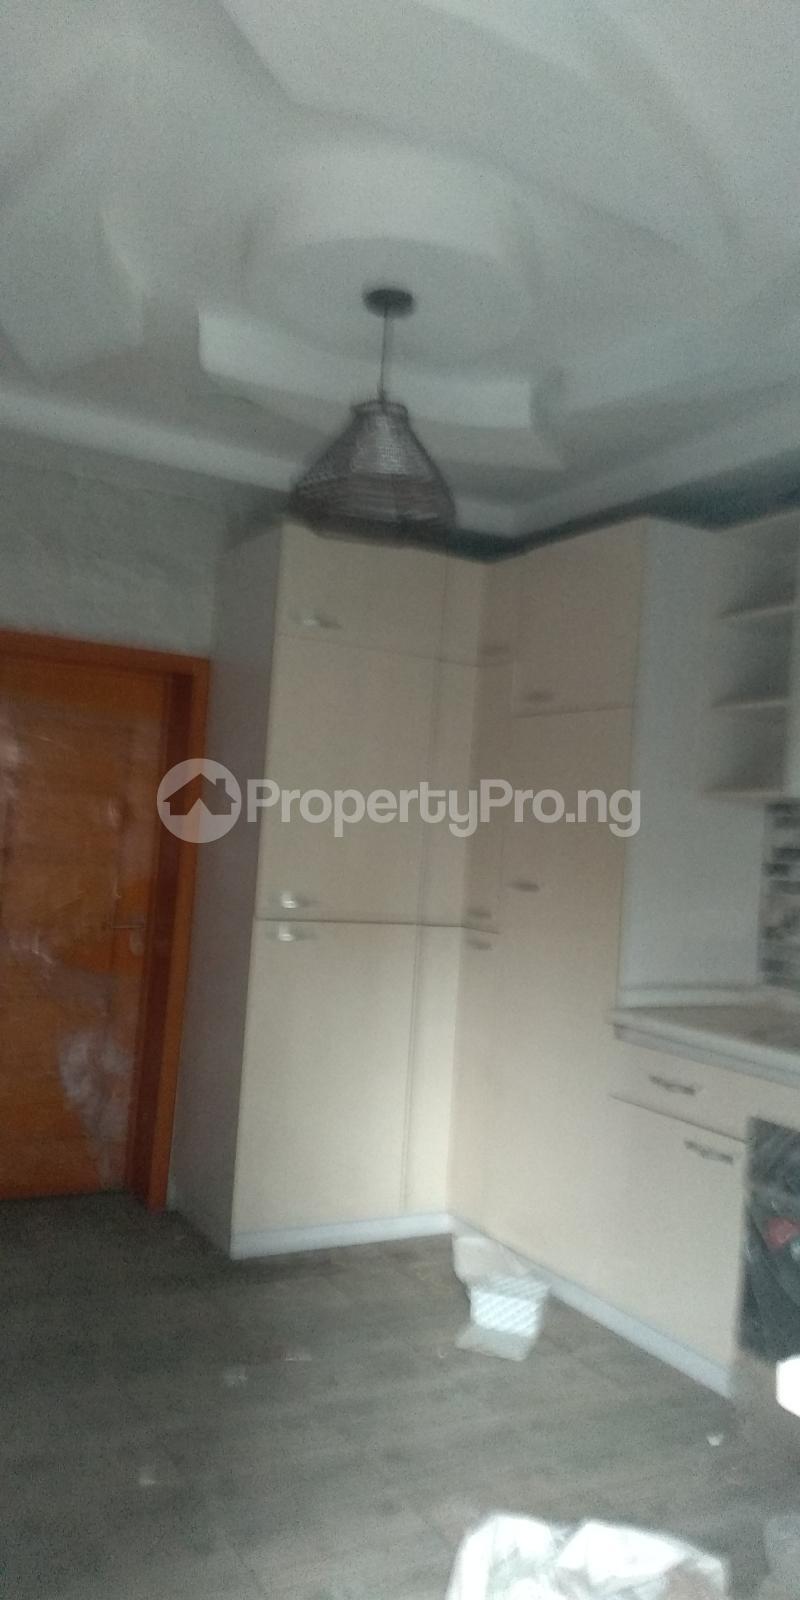 5 bedroom Land for sale Bashiru shittu street magodo shangisha Magodo GRA Phase 2 Kosofe/Ikosi Lagos - 9